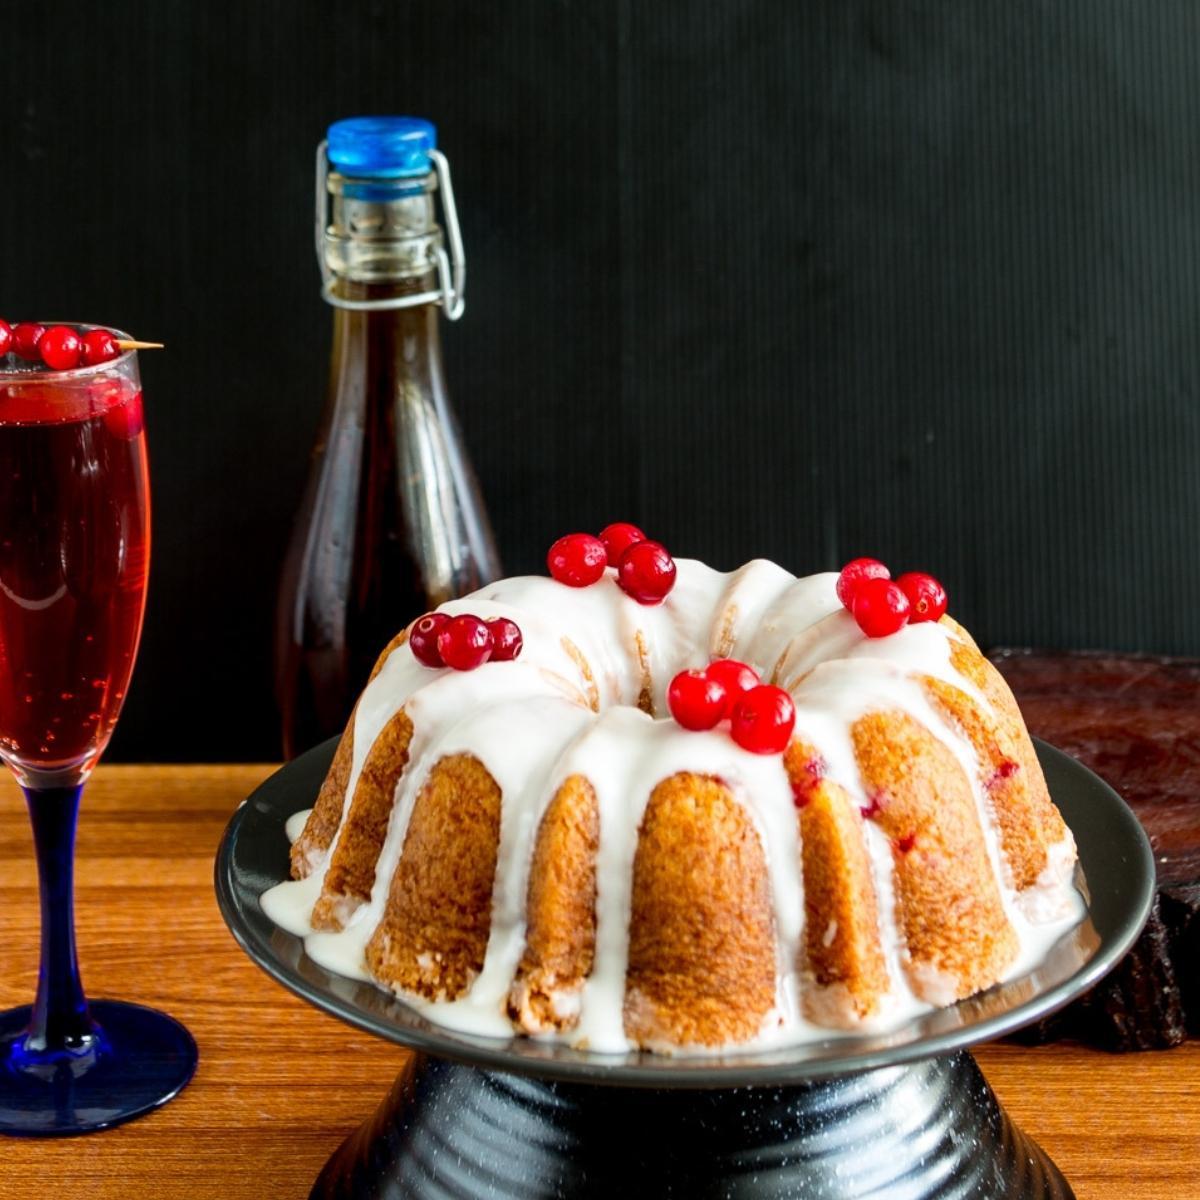 A cranberry bundt cake on a cake baord